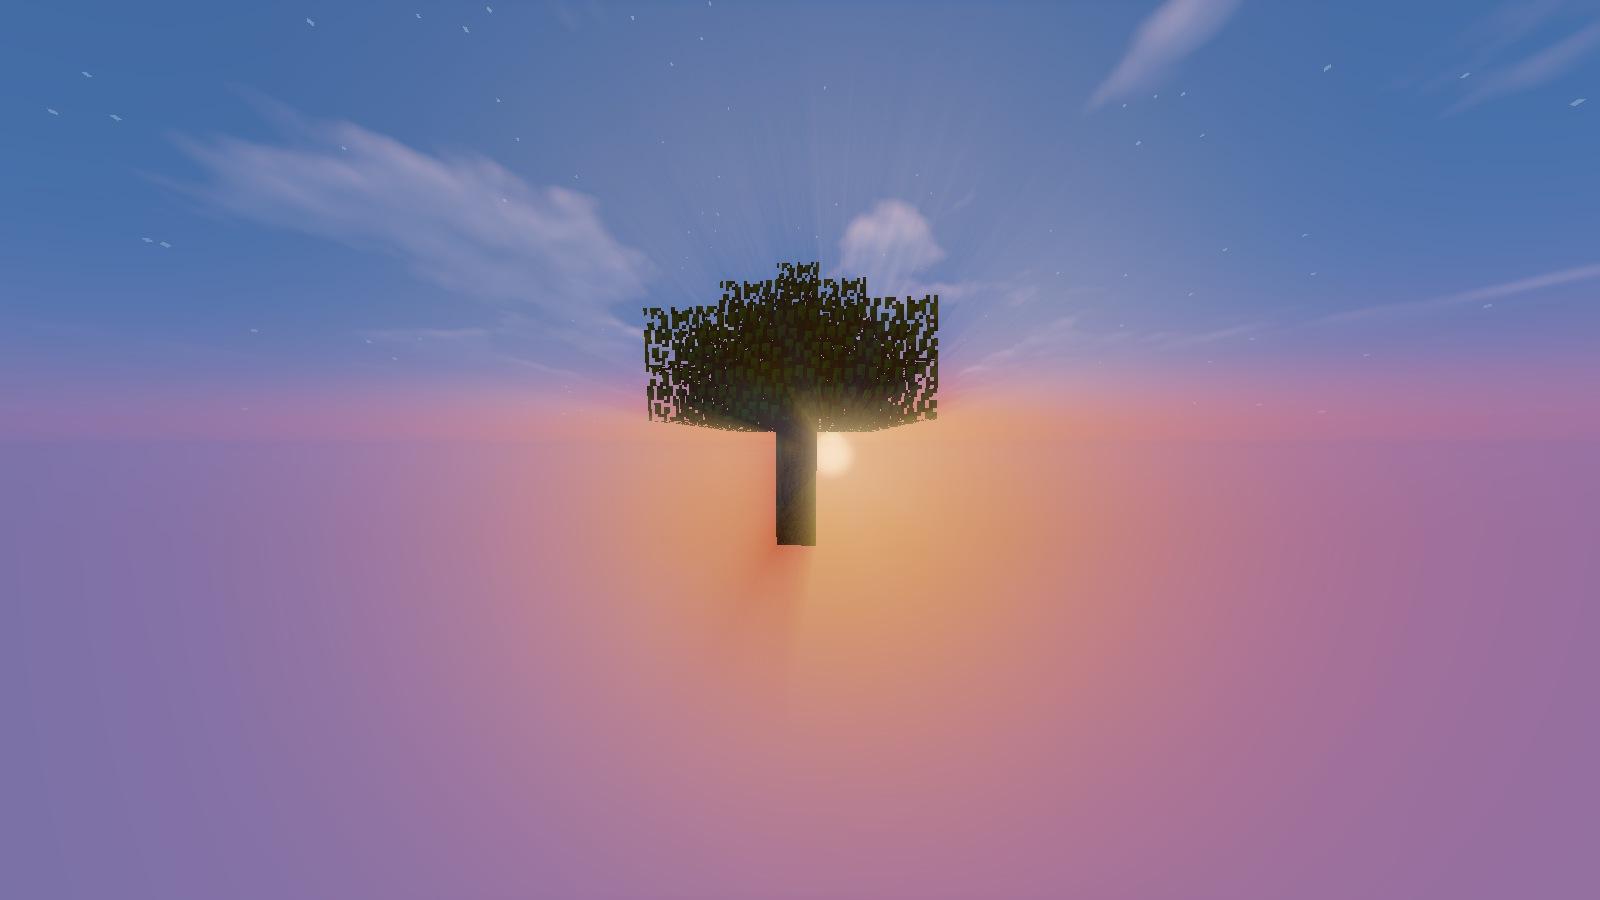 GrumpyCraft Infinity Evolved SkyBlock Server! - PC Servers